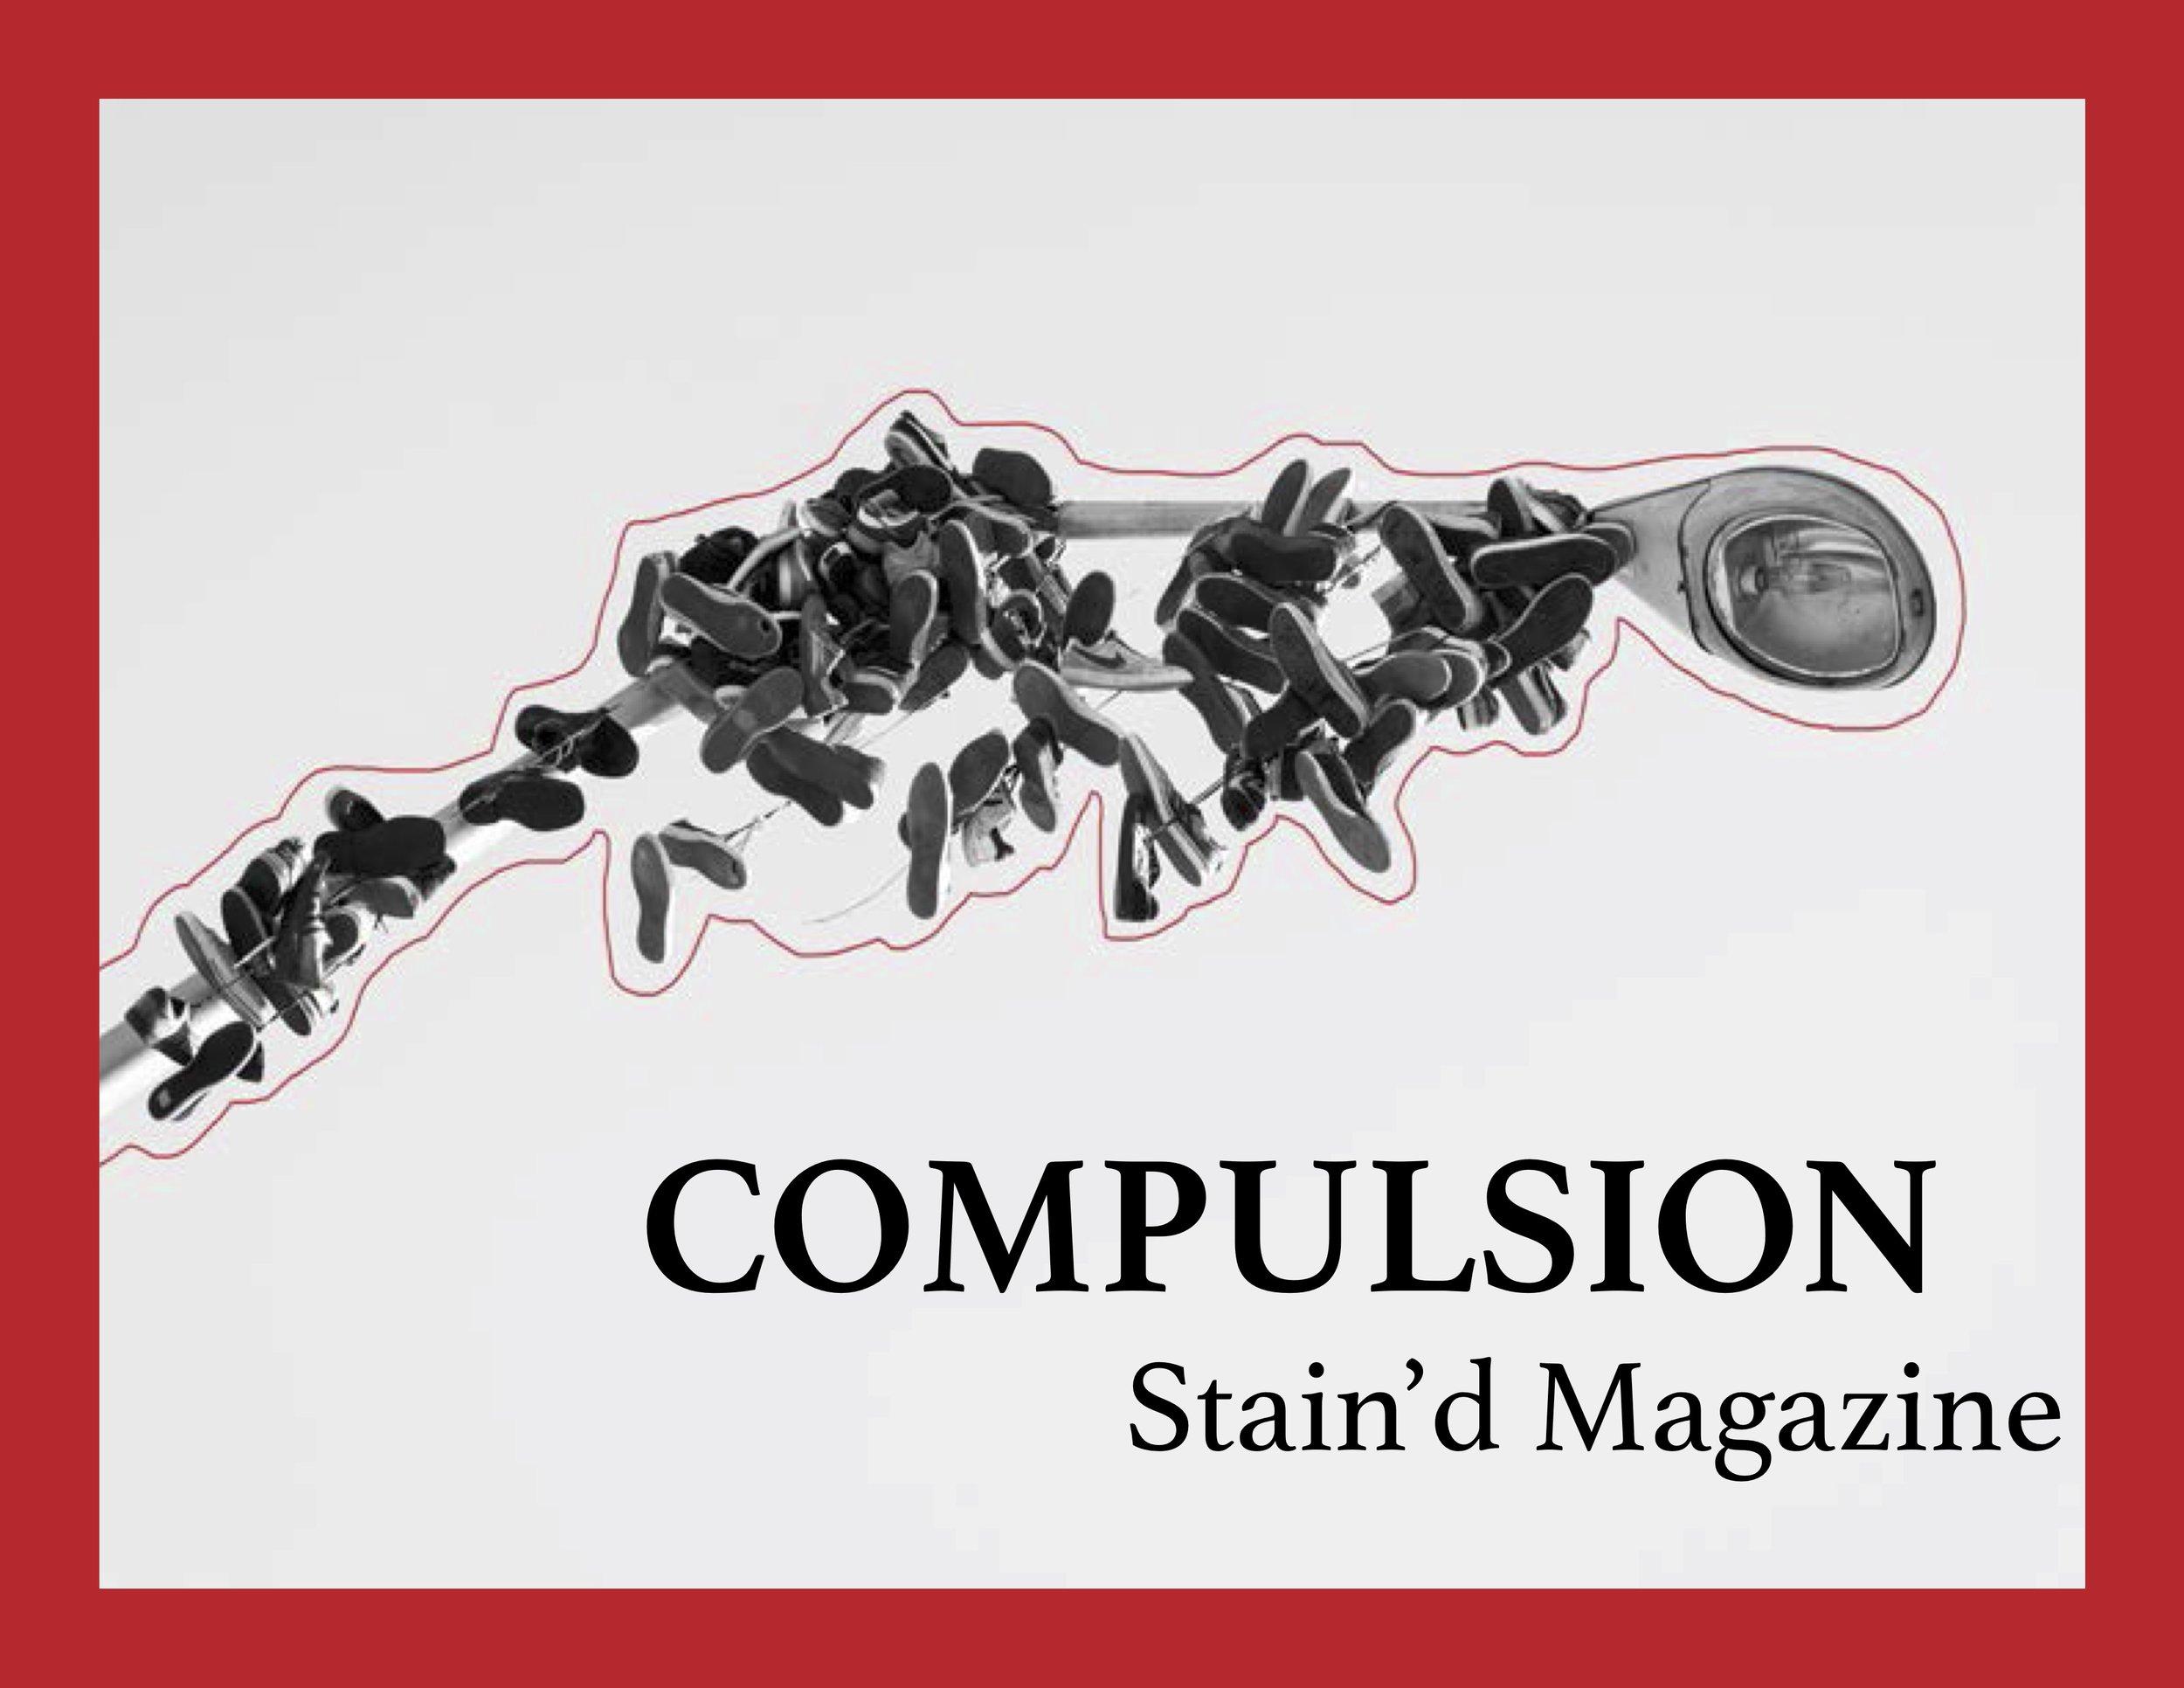 compulsion complete1.jpg